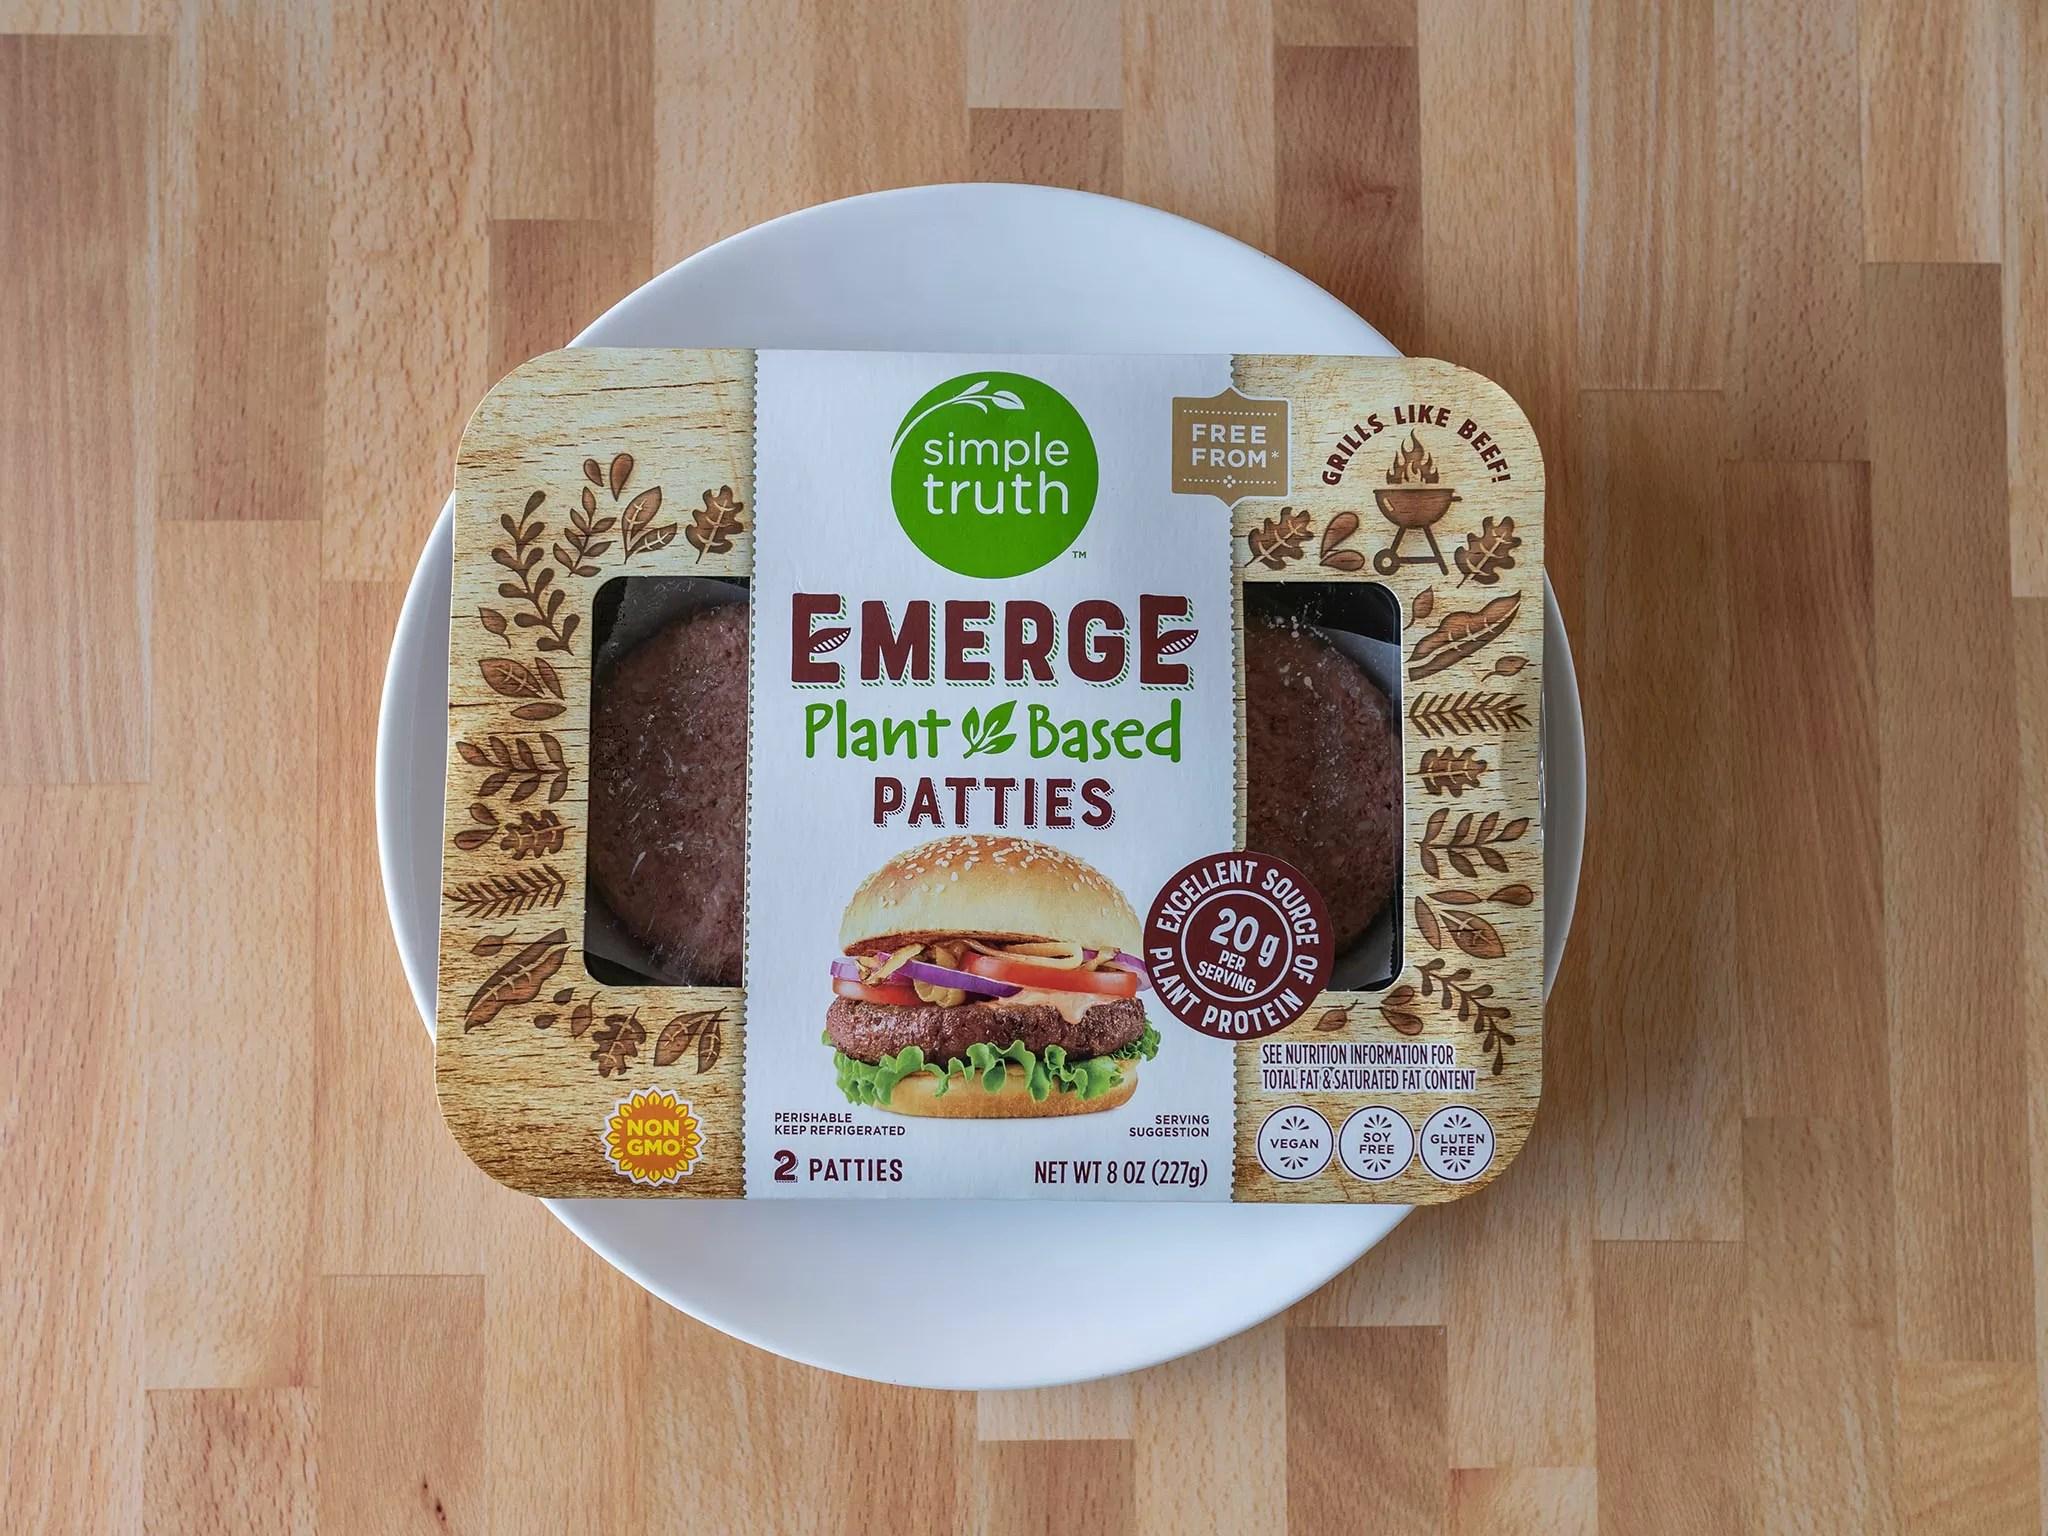 Simple Truth Emerge Plant Based burgers